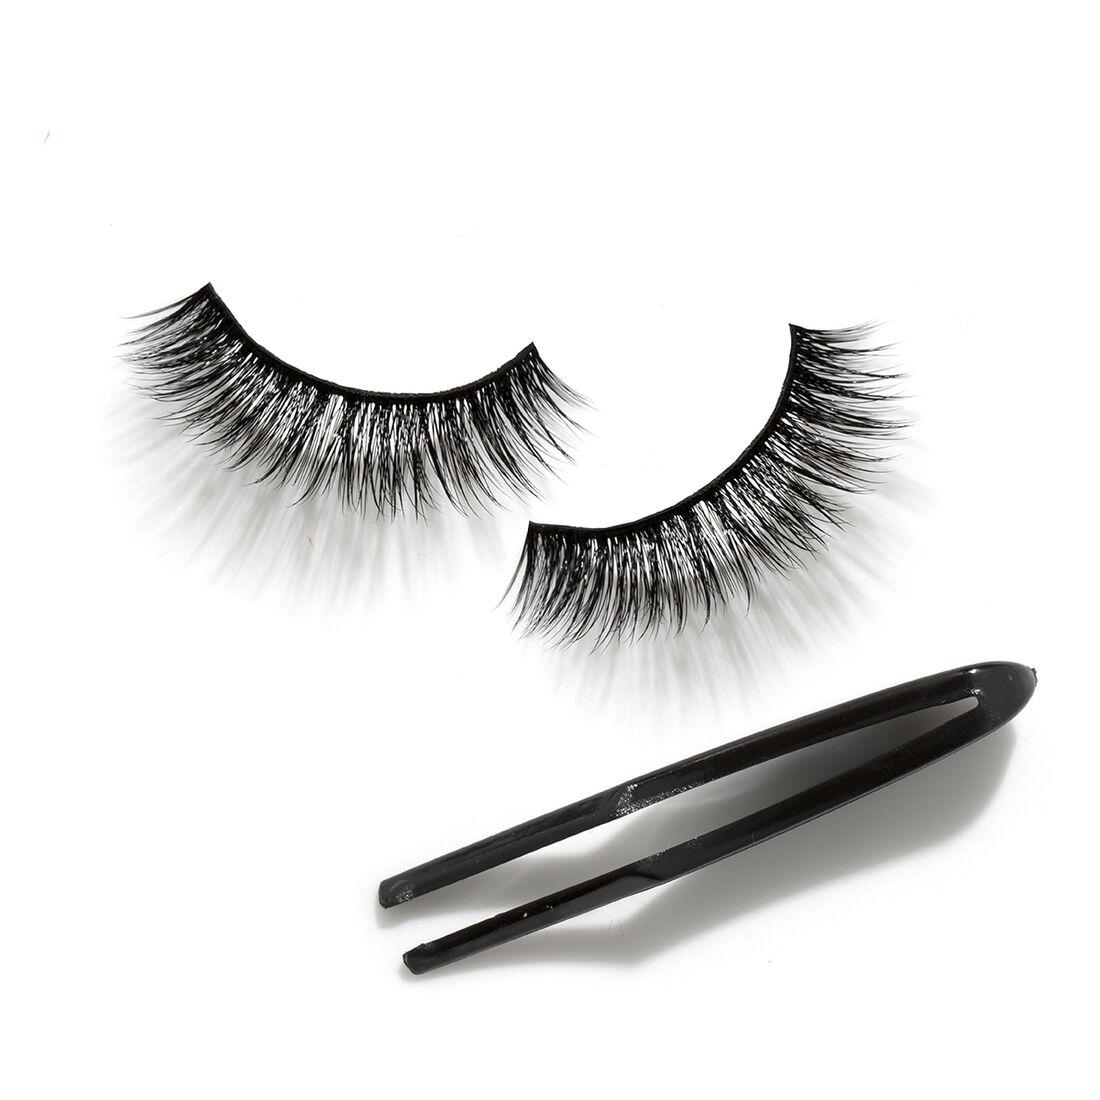 ELF Cosmetics - Weylie x e.l.f. Luxe Lash Kit 2.0